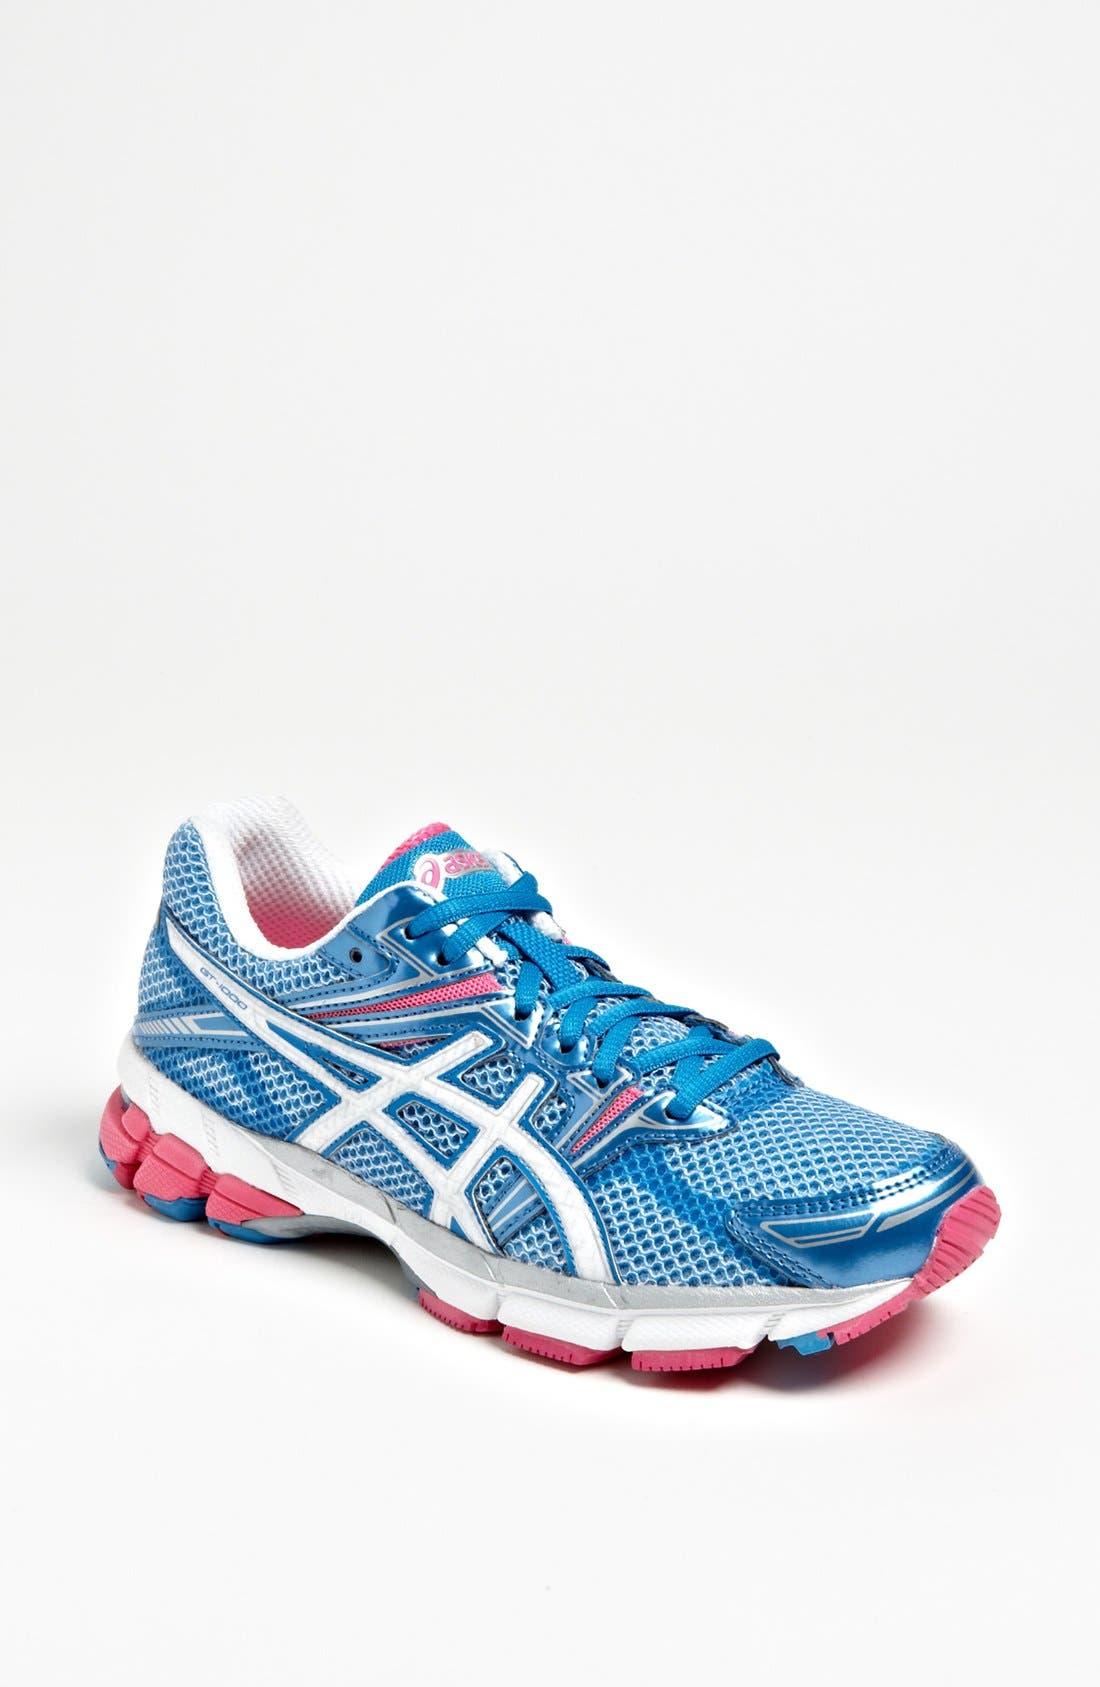 Main Image - ASICS® 'GT-1000™' Running Shoe (Women)